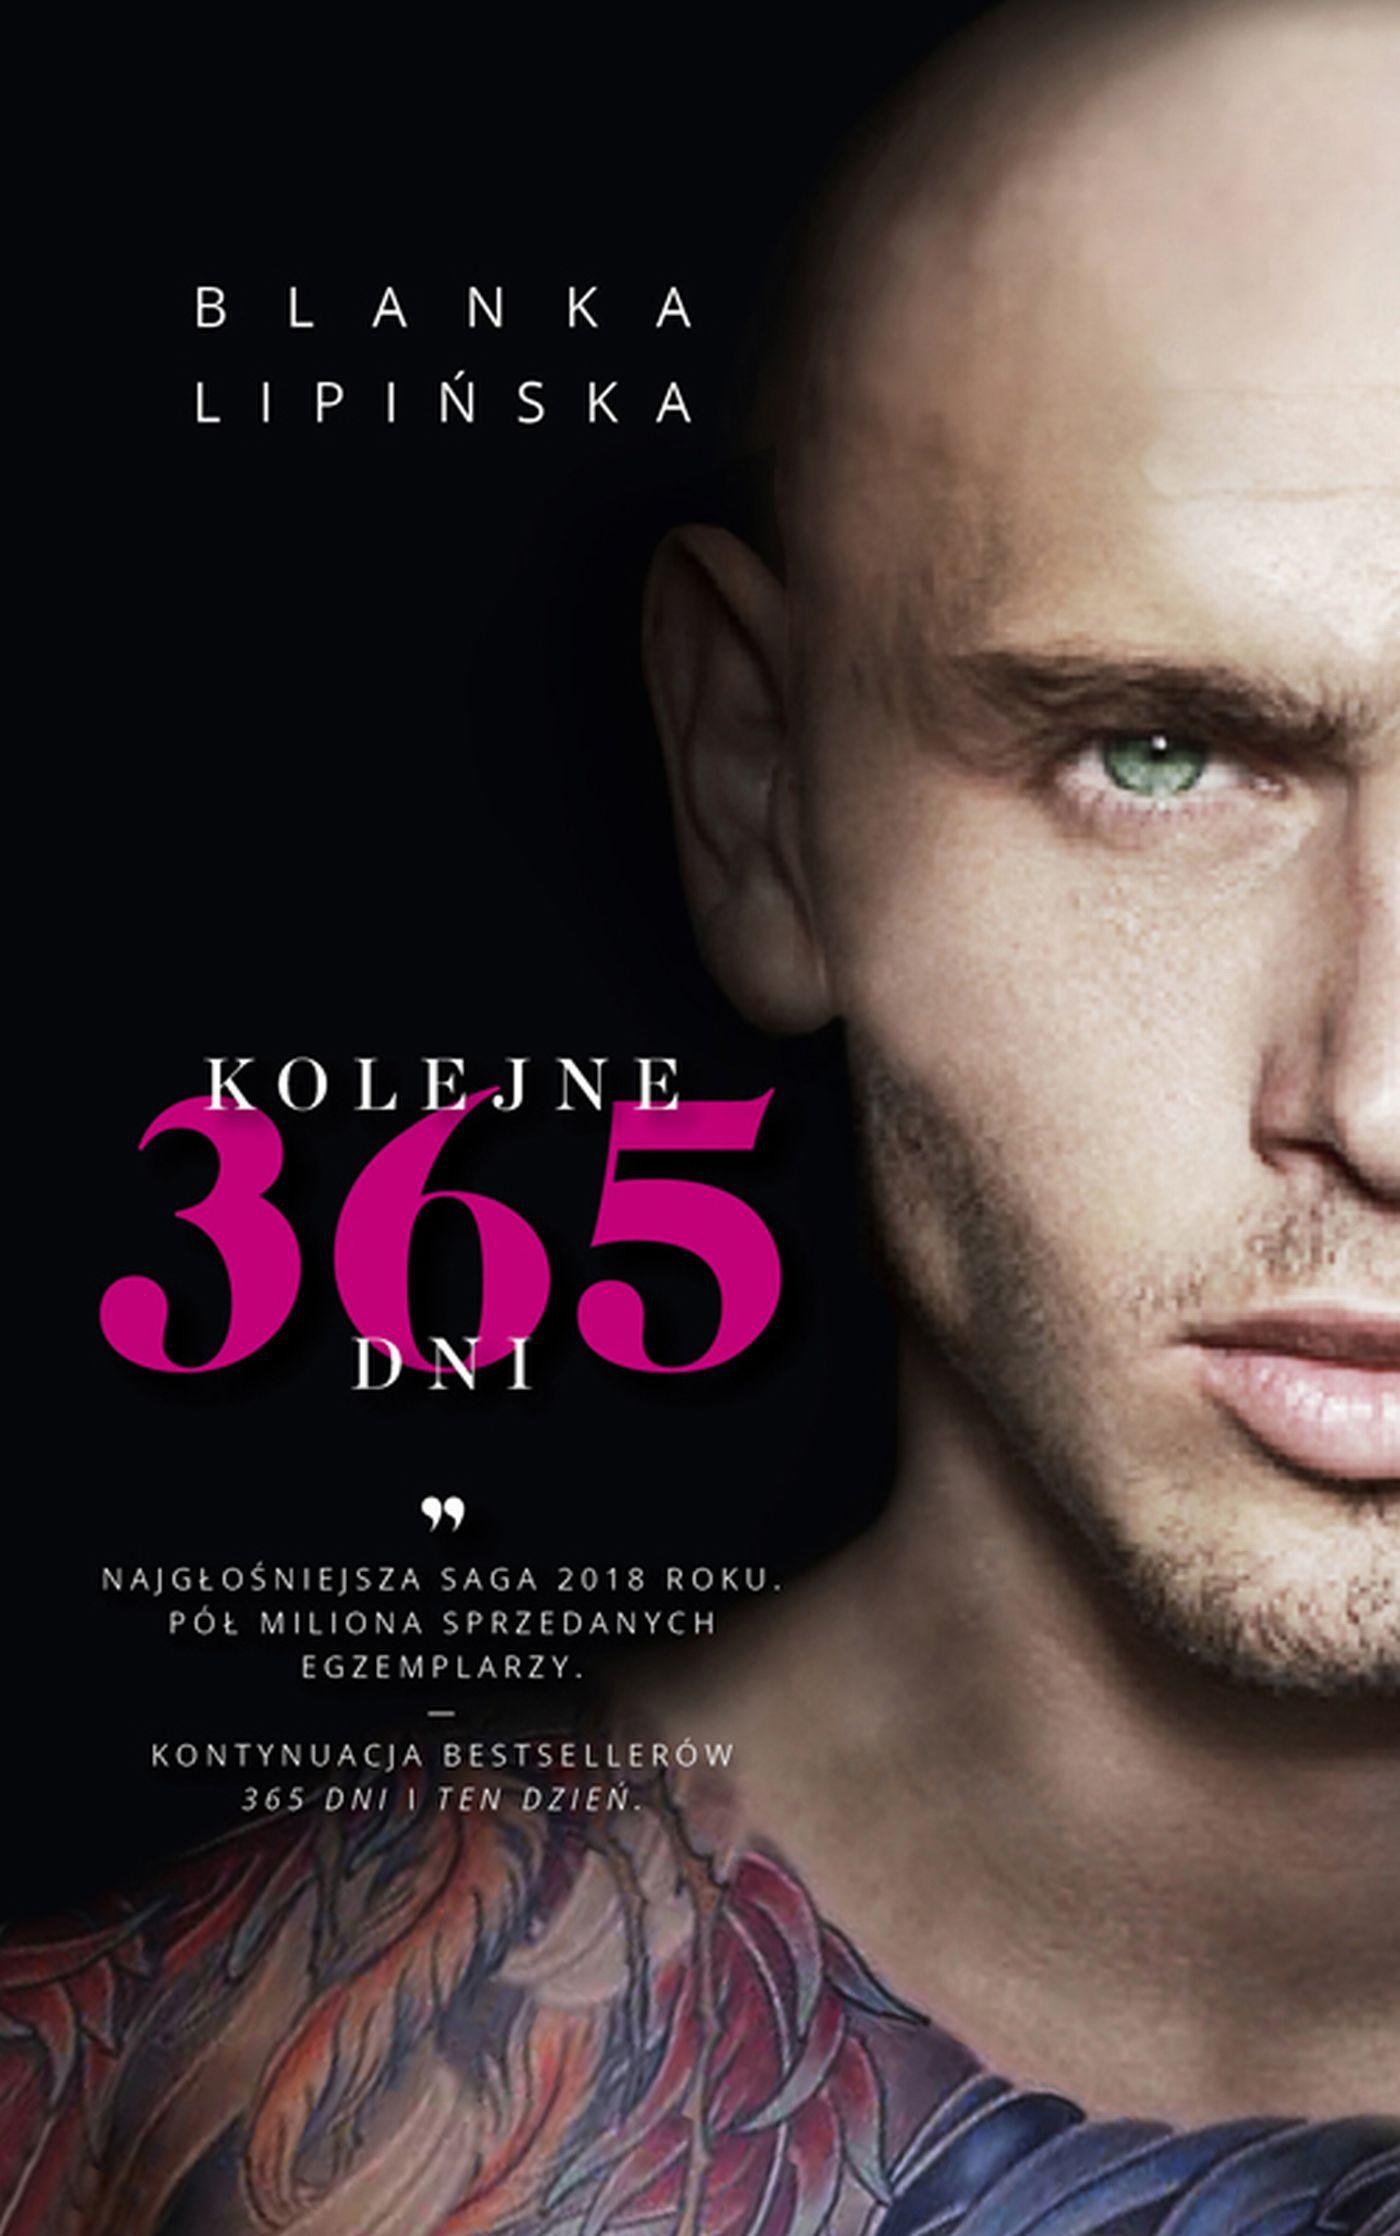 Kolejne 365 dni - Ebook (Książka na Kindle) do pobrania w formacie MOBI